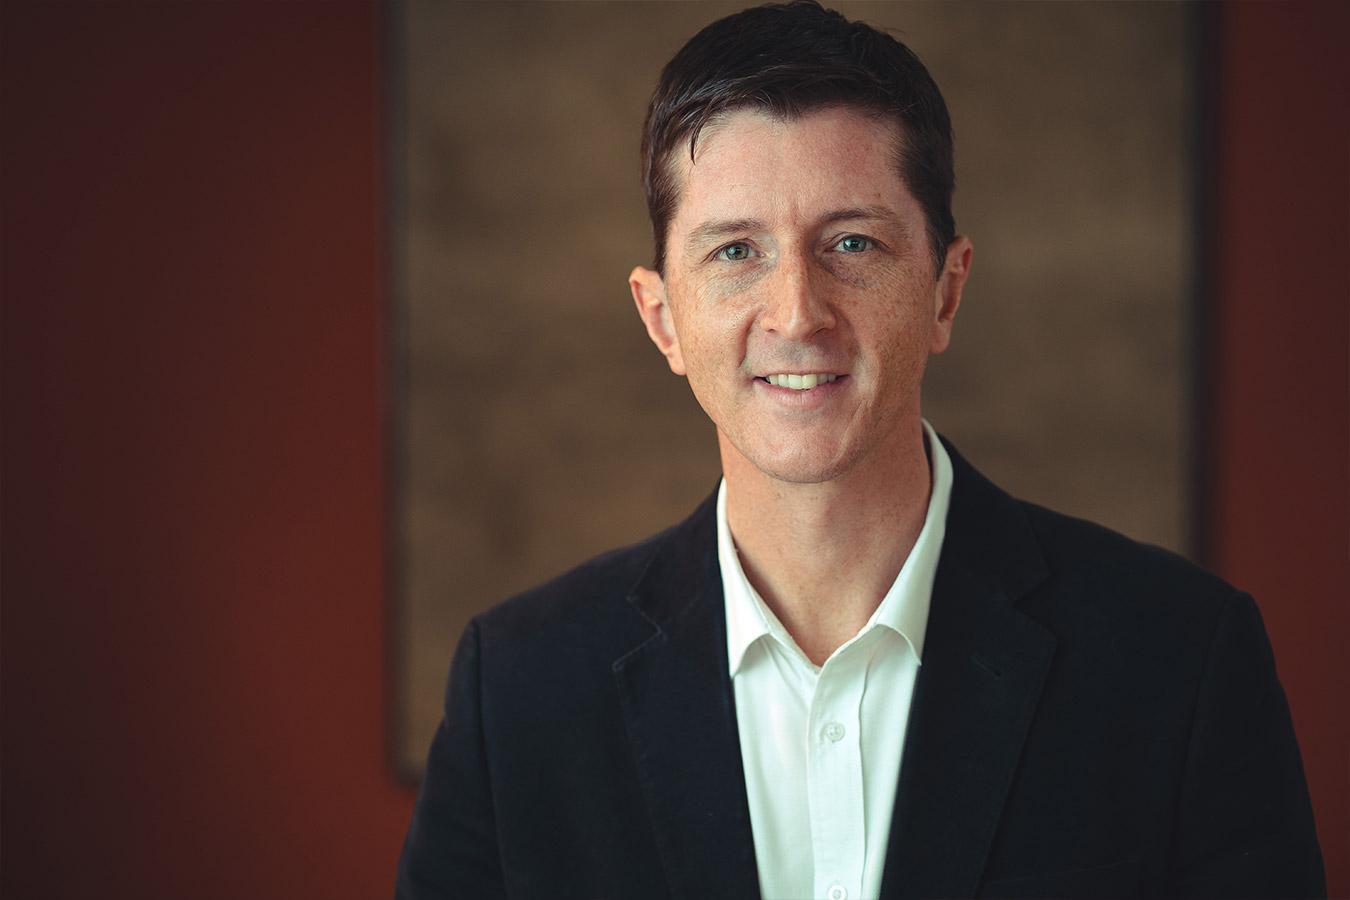 Grant Gavin Entrepreneur